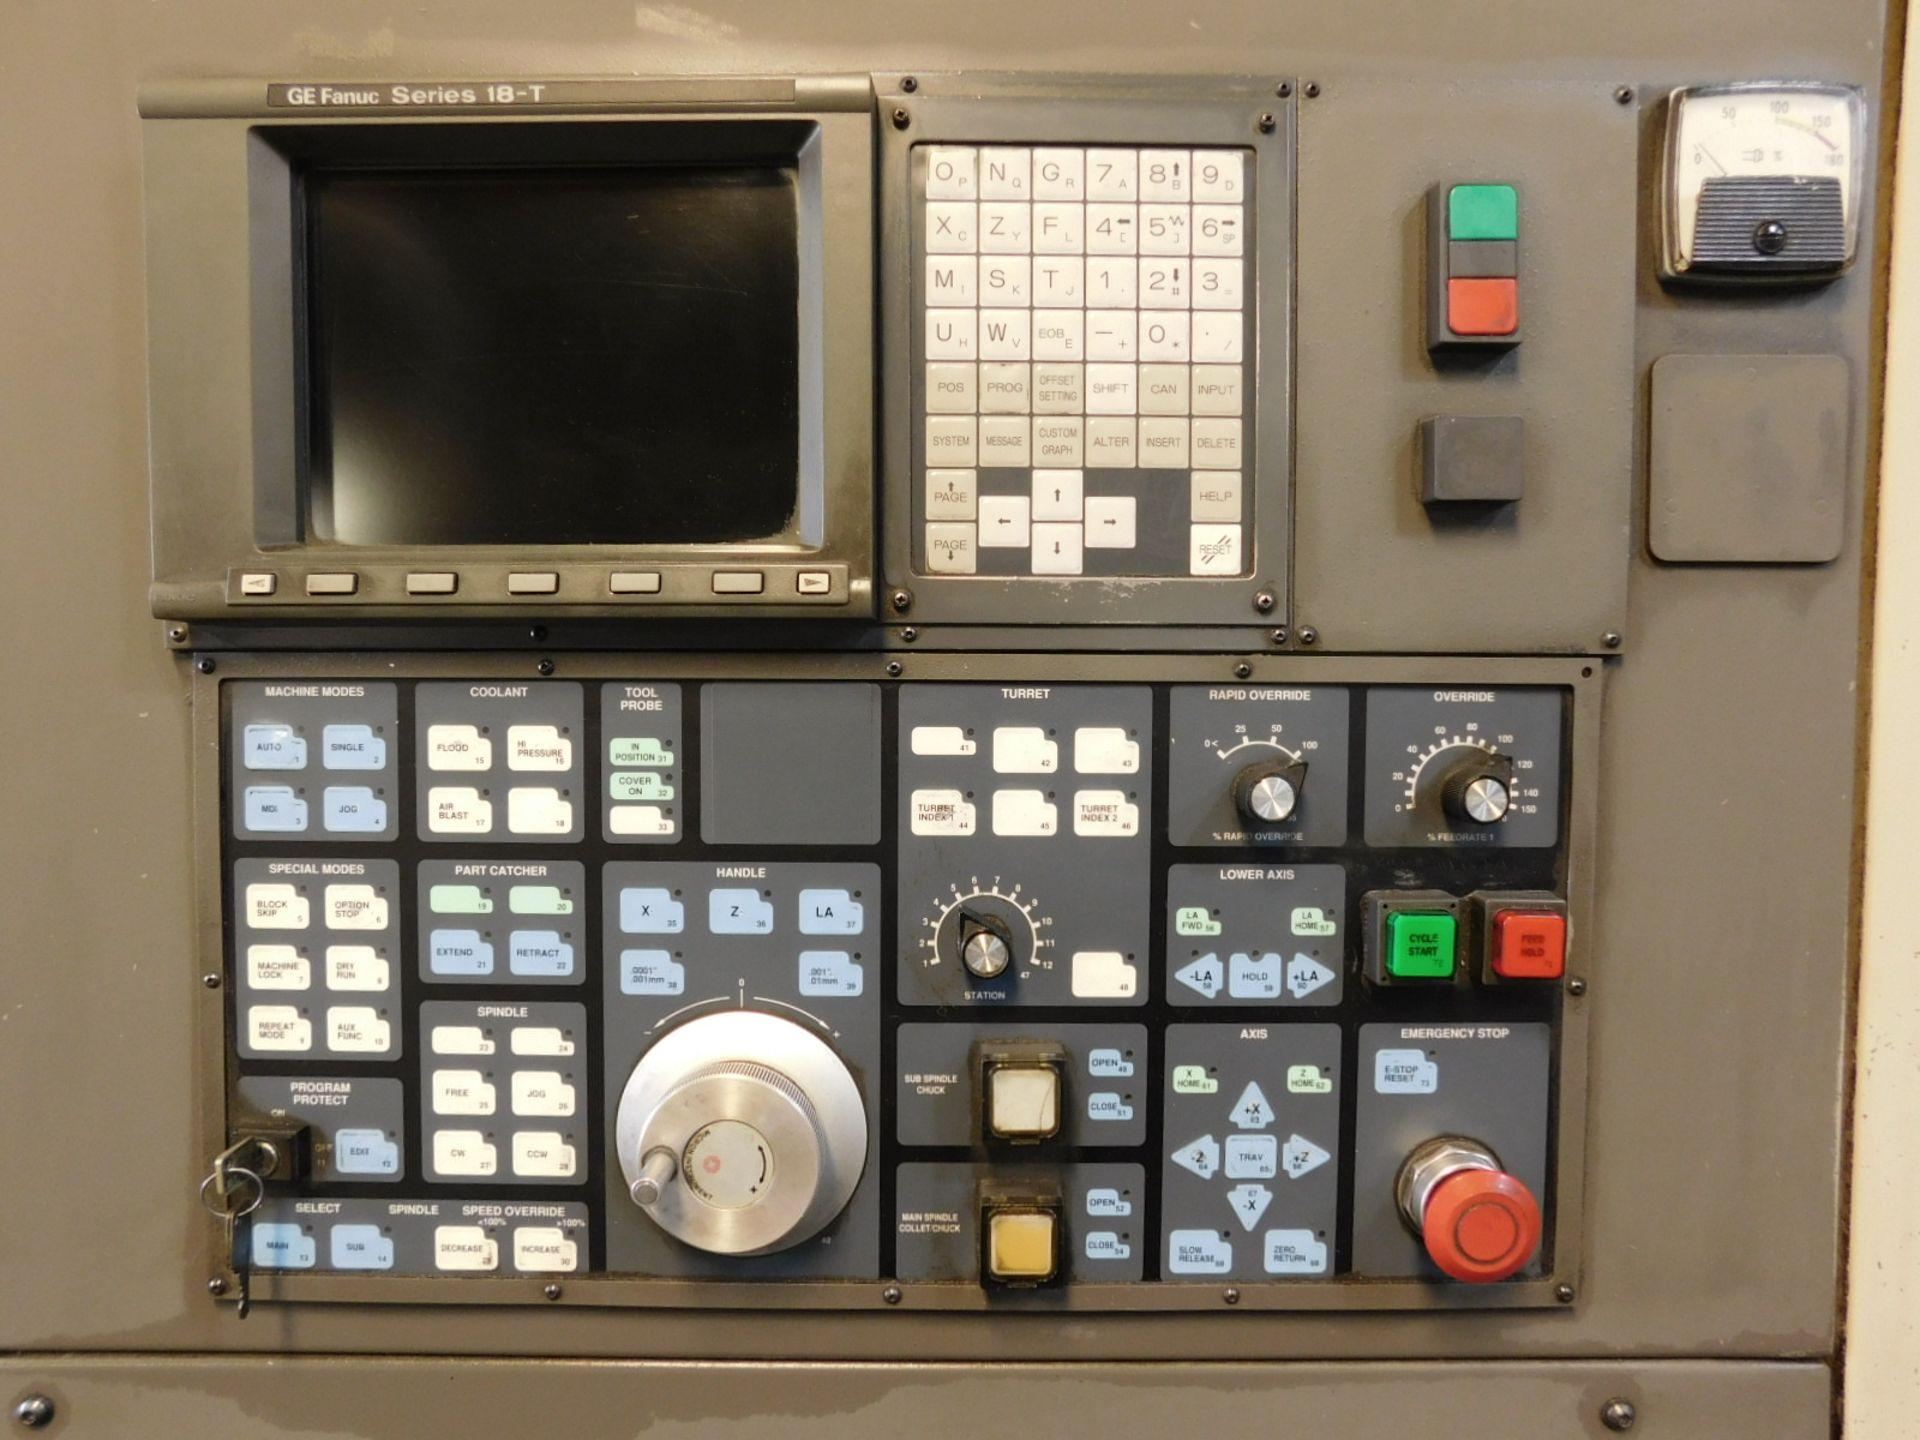 HARDINGE CONQUEST T-42 CNC LATHE, MODEL SG42, FANUC 18-T CNC CONTROL, 12-STATION TURRET, - Image 3 of 27